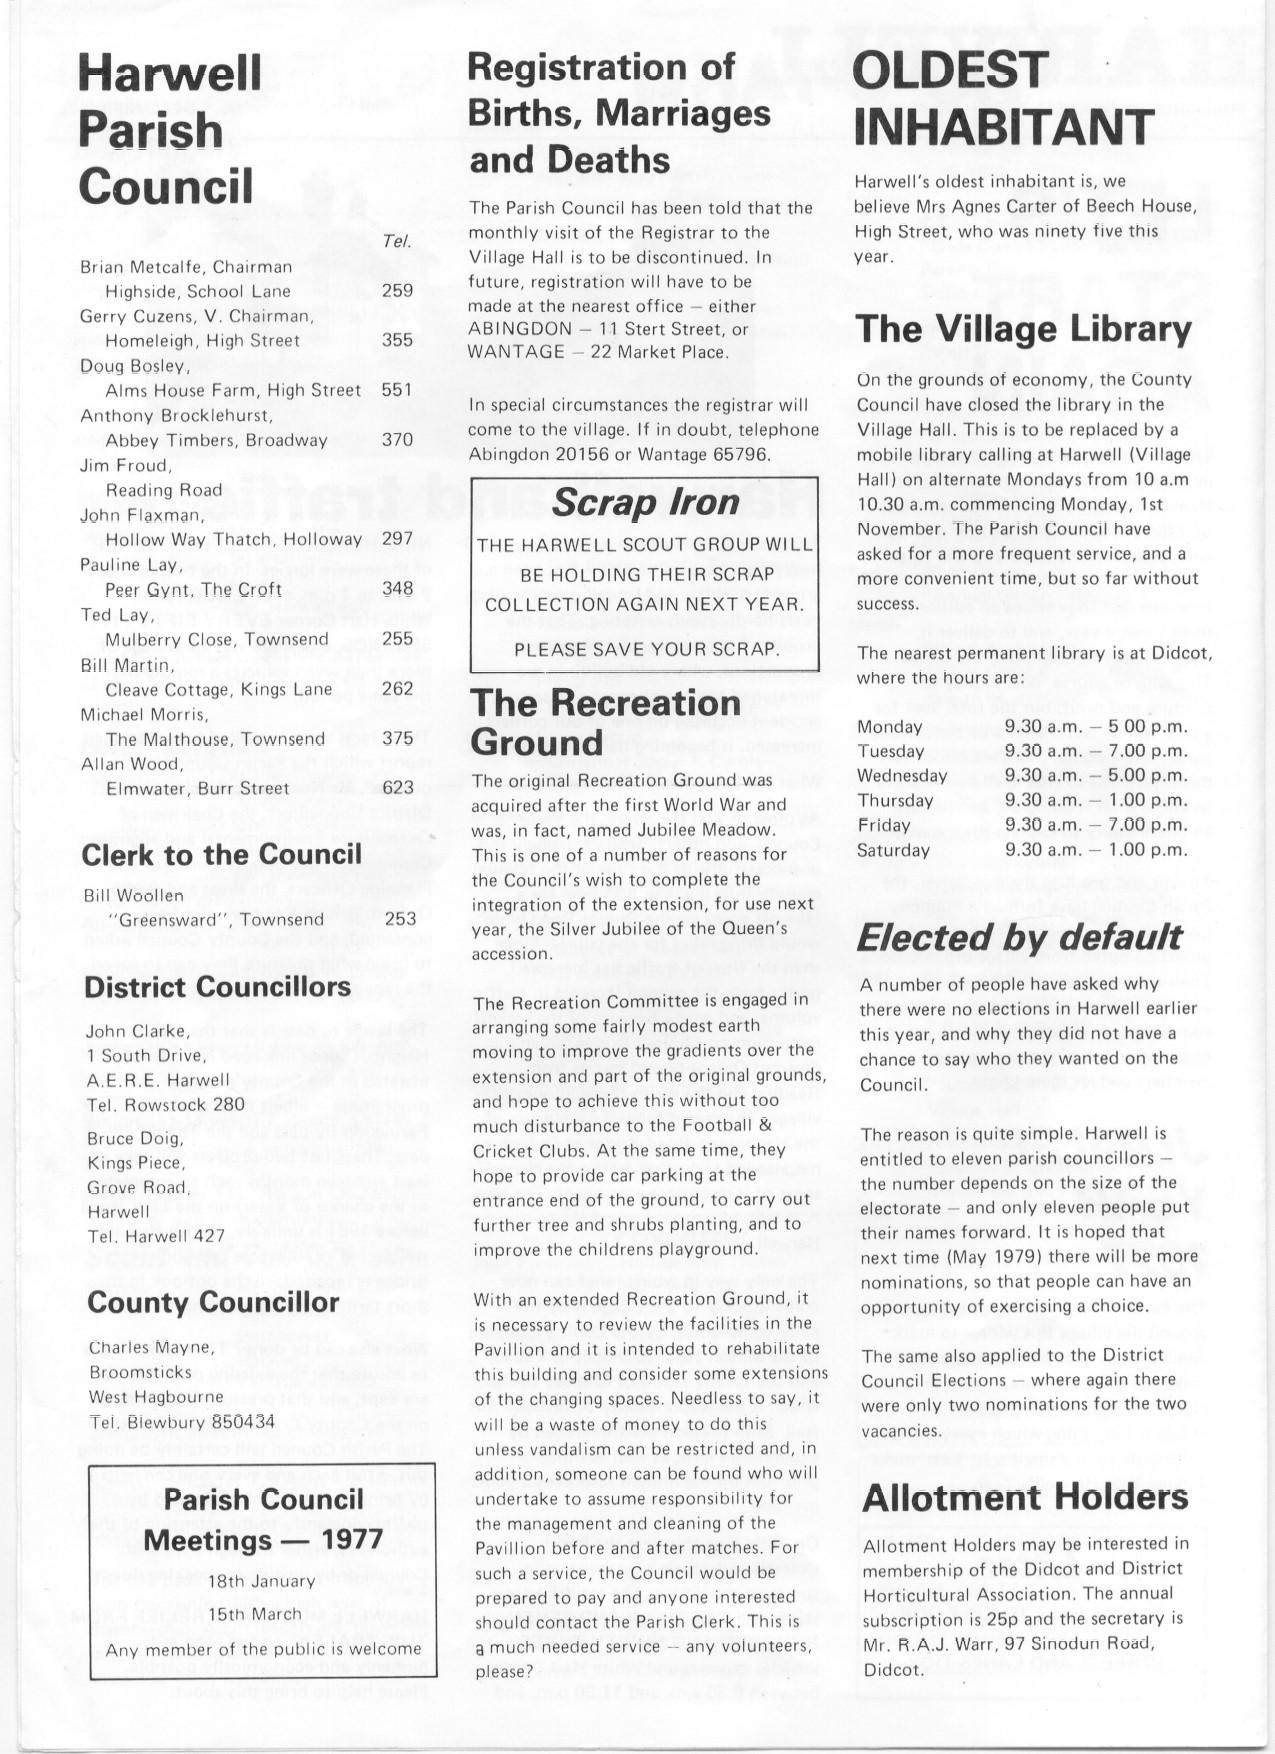 hn001_page2